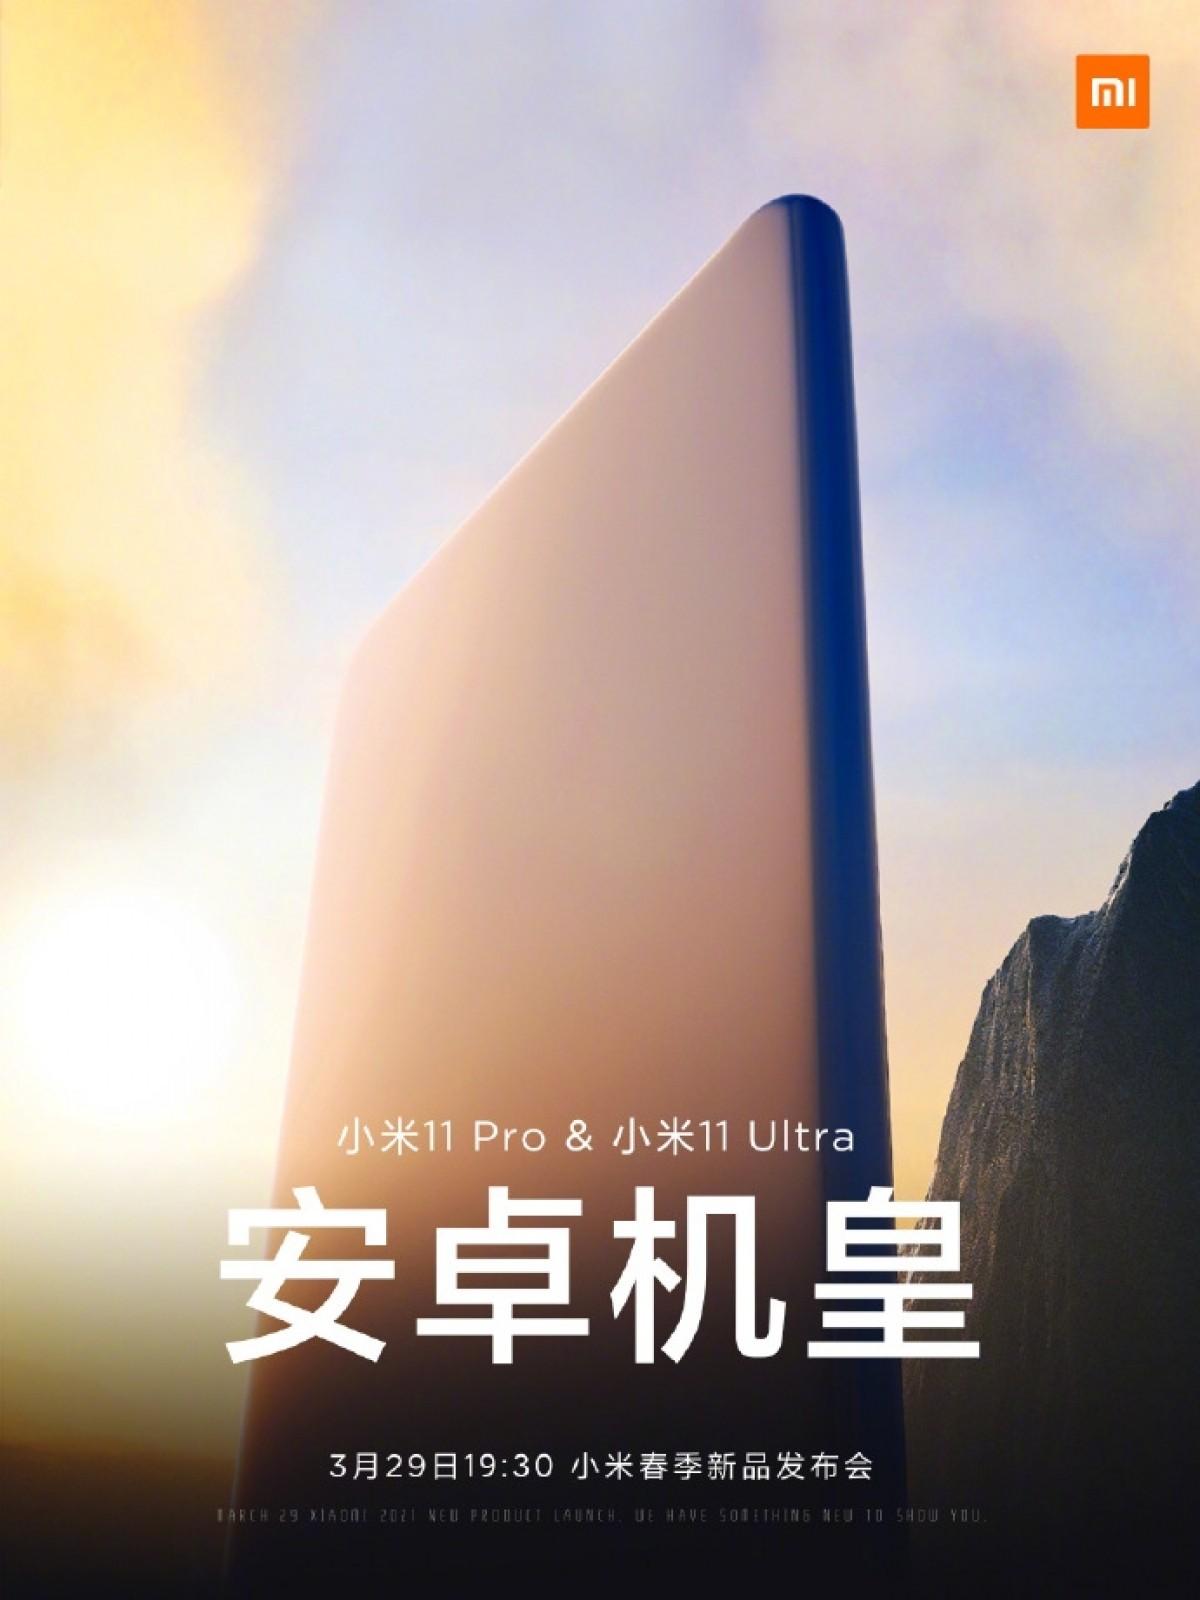 Xiaomi Mi 11 Pro and Mi 11 Ultra event